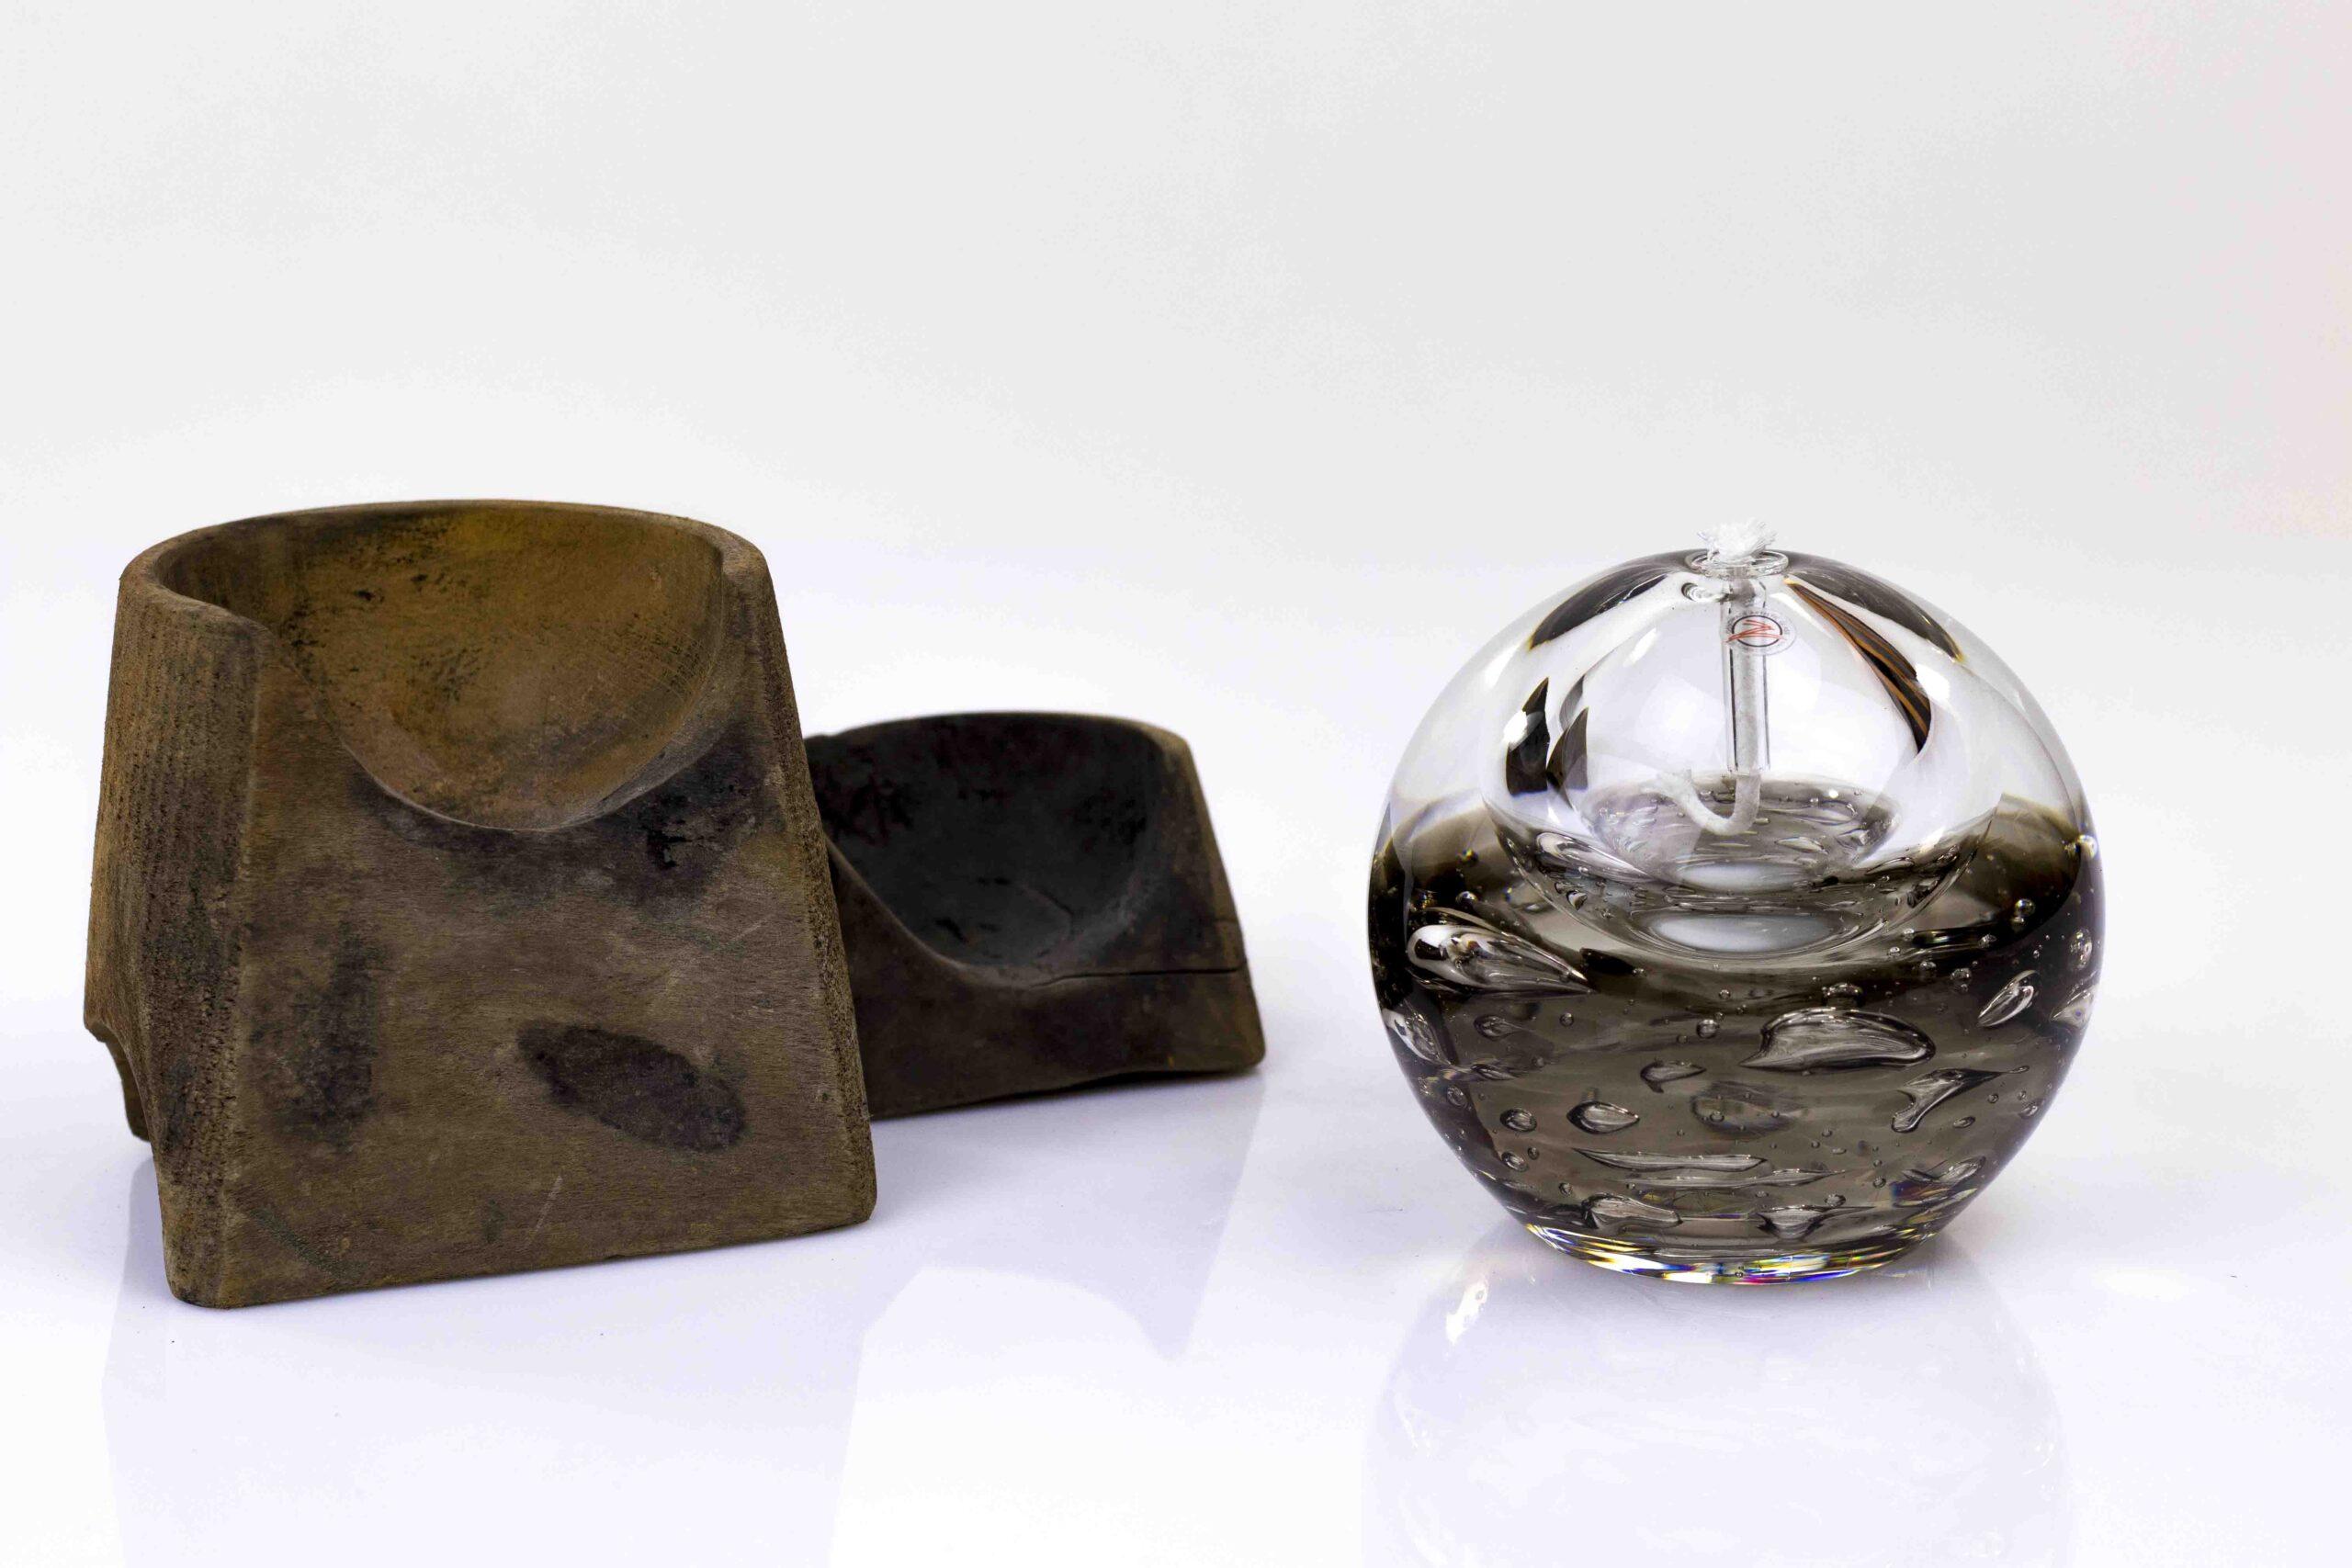 Olielamp van Ozzaro Boheems Kristal